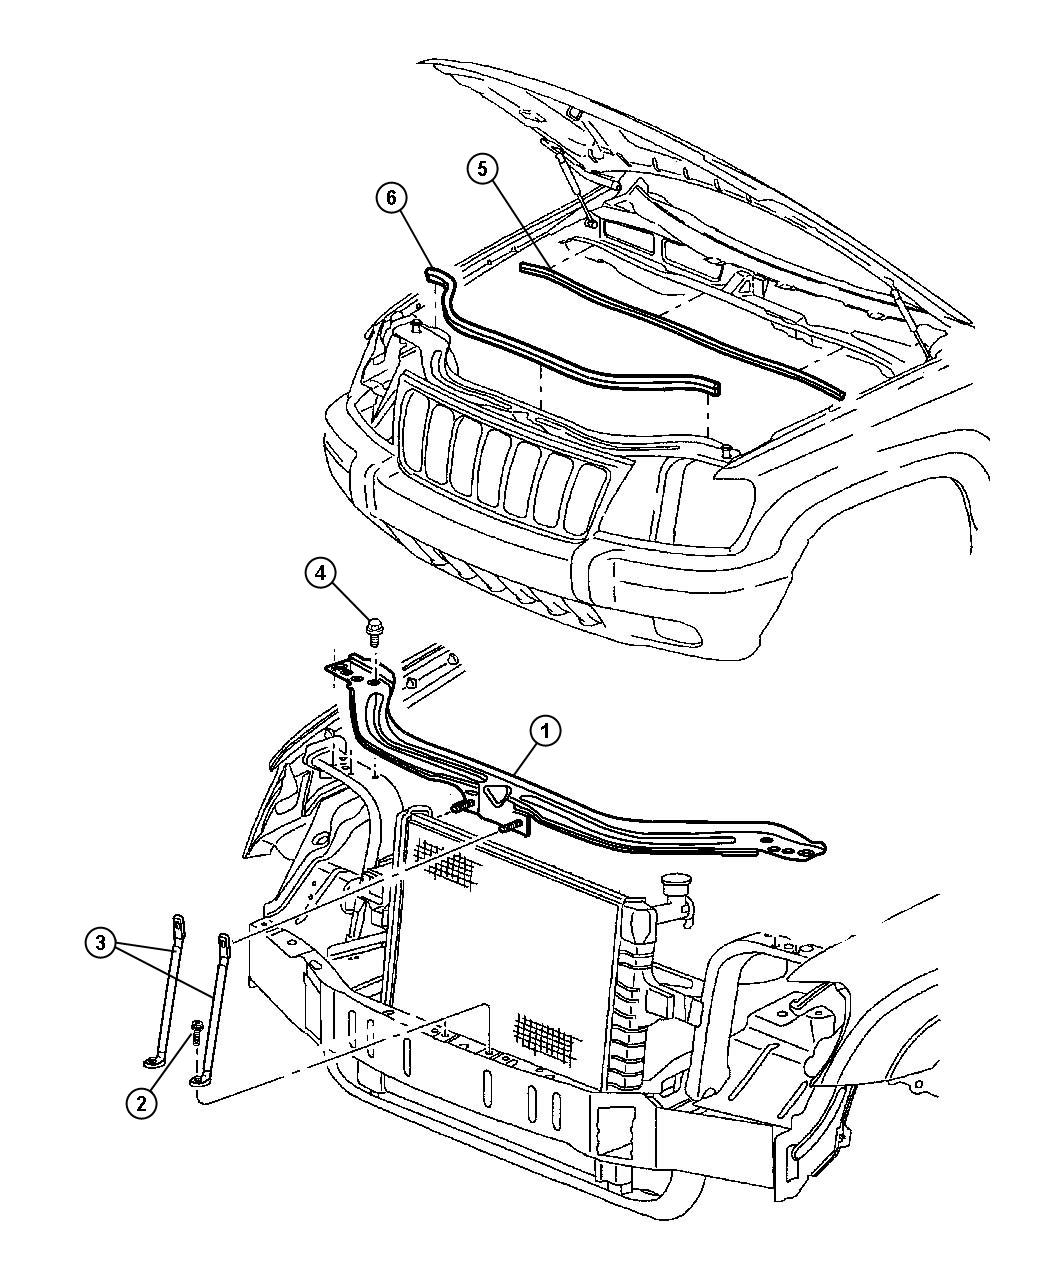 2010 Jeep Wrangler UNLIMITED X 3.8L V6 A/T 4X4 Screw